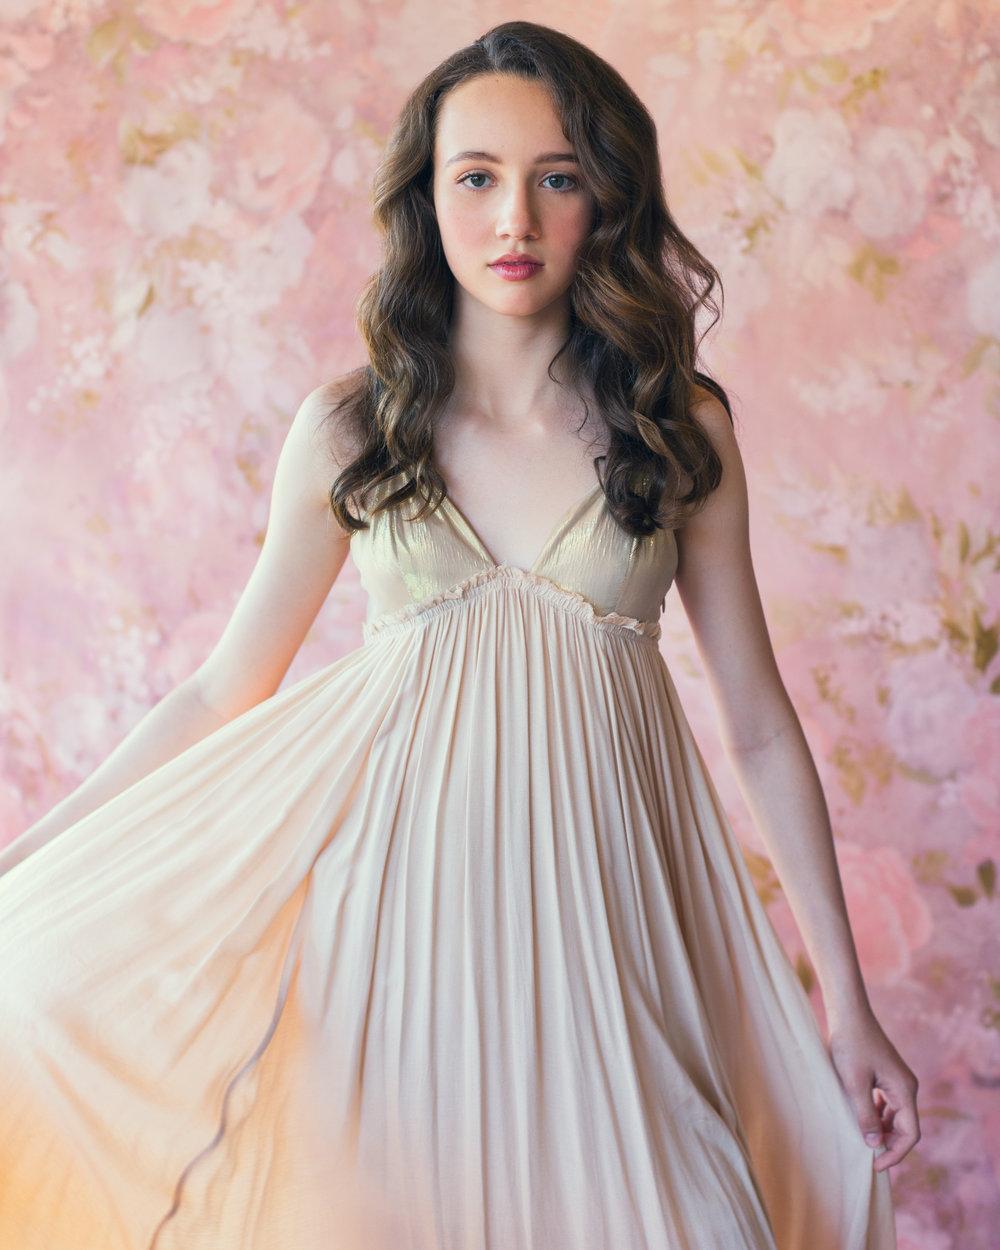 Teen_Portrait_Claudine_Williams 3.jpg